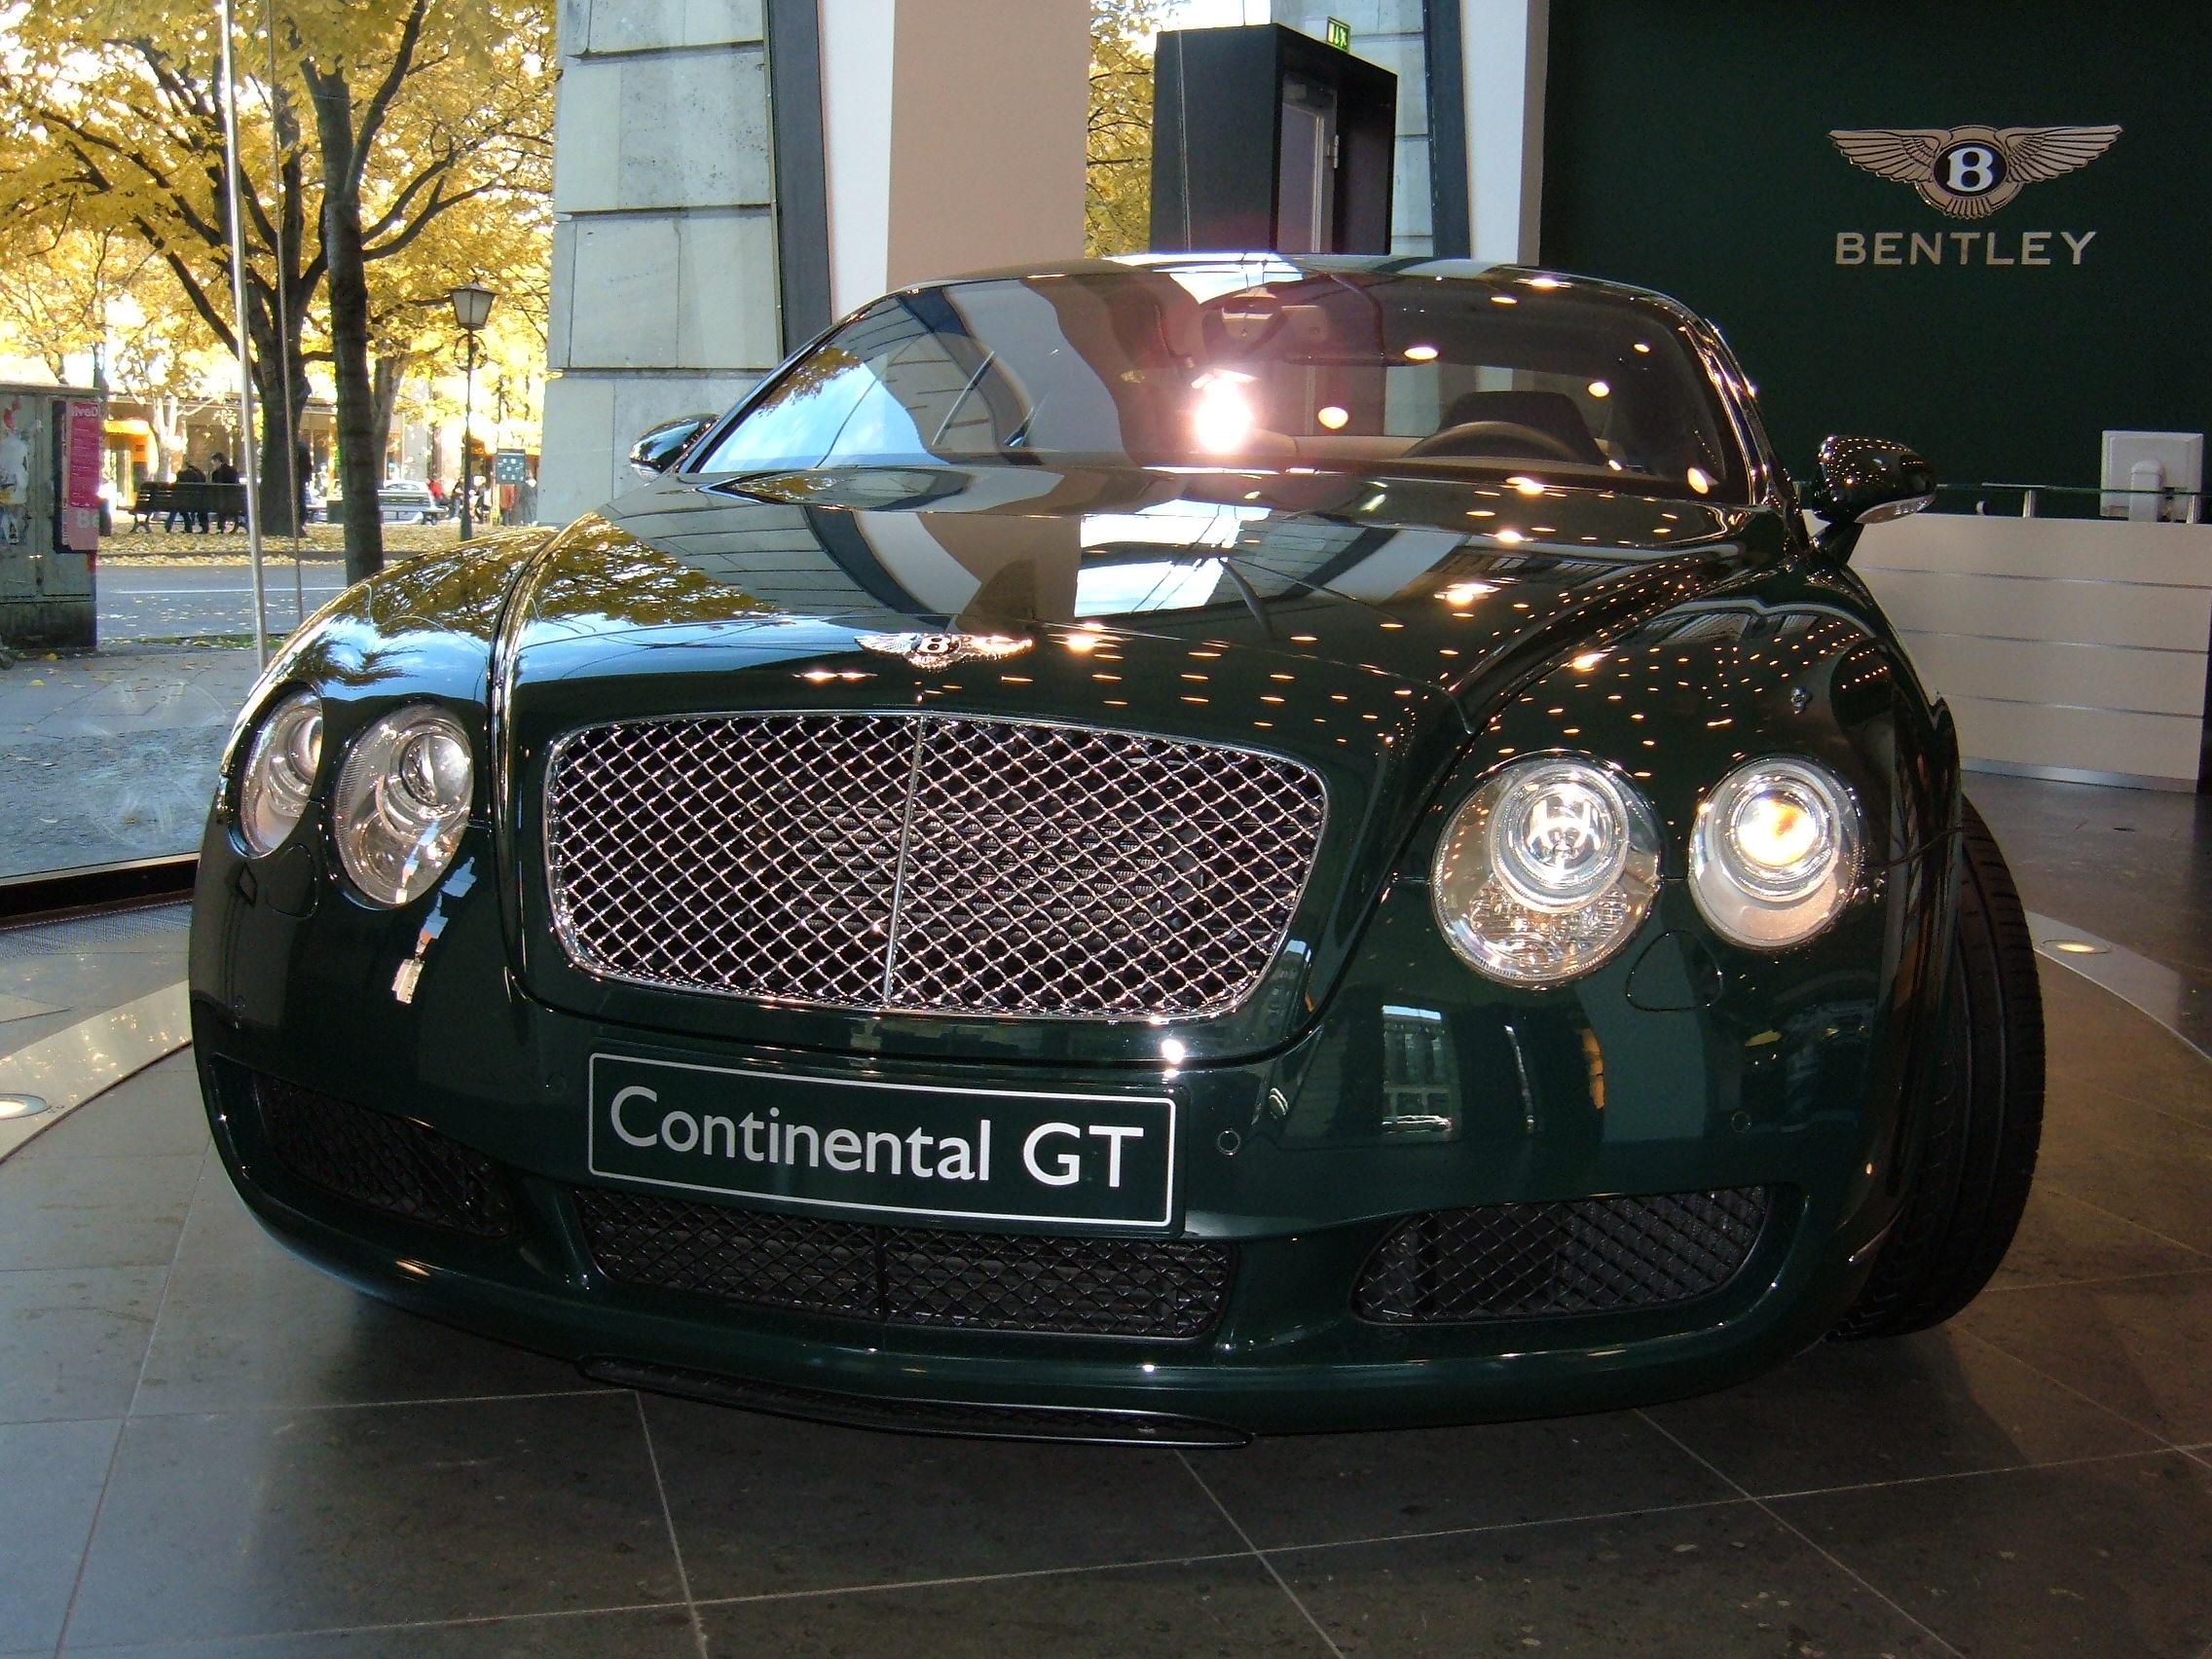 File:2005 green Bentley Continental GT front.JPG ...